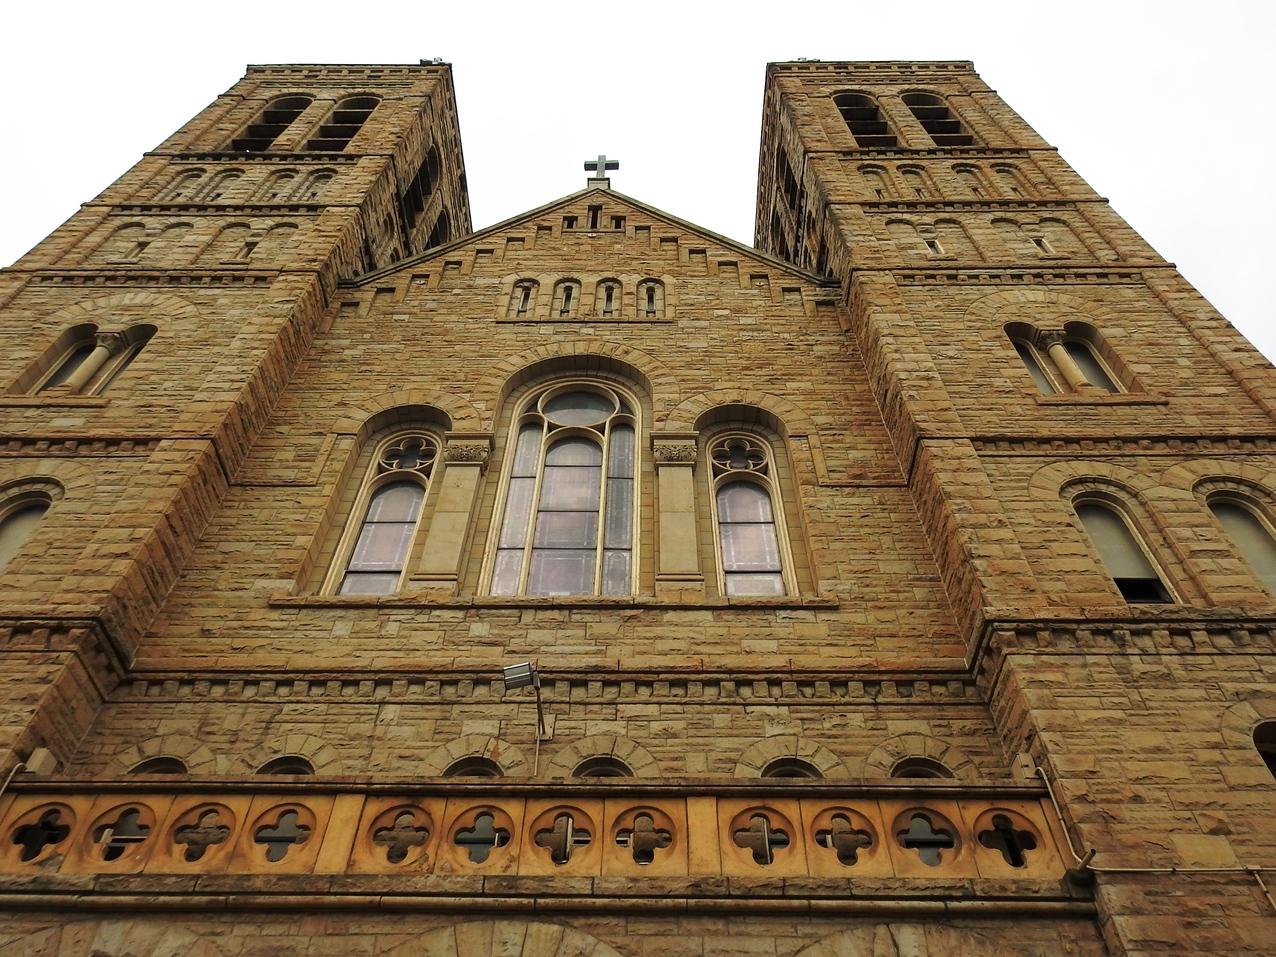 Concert series kicks off as part of St. Bernard Parish's 'Moving Forward in Faith' capital campaign